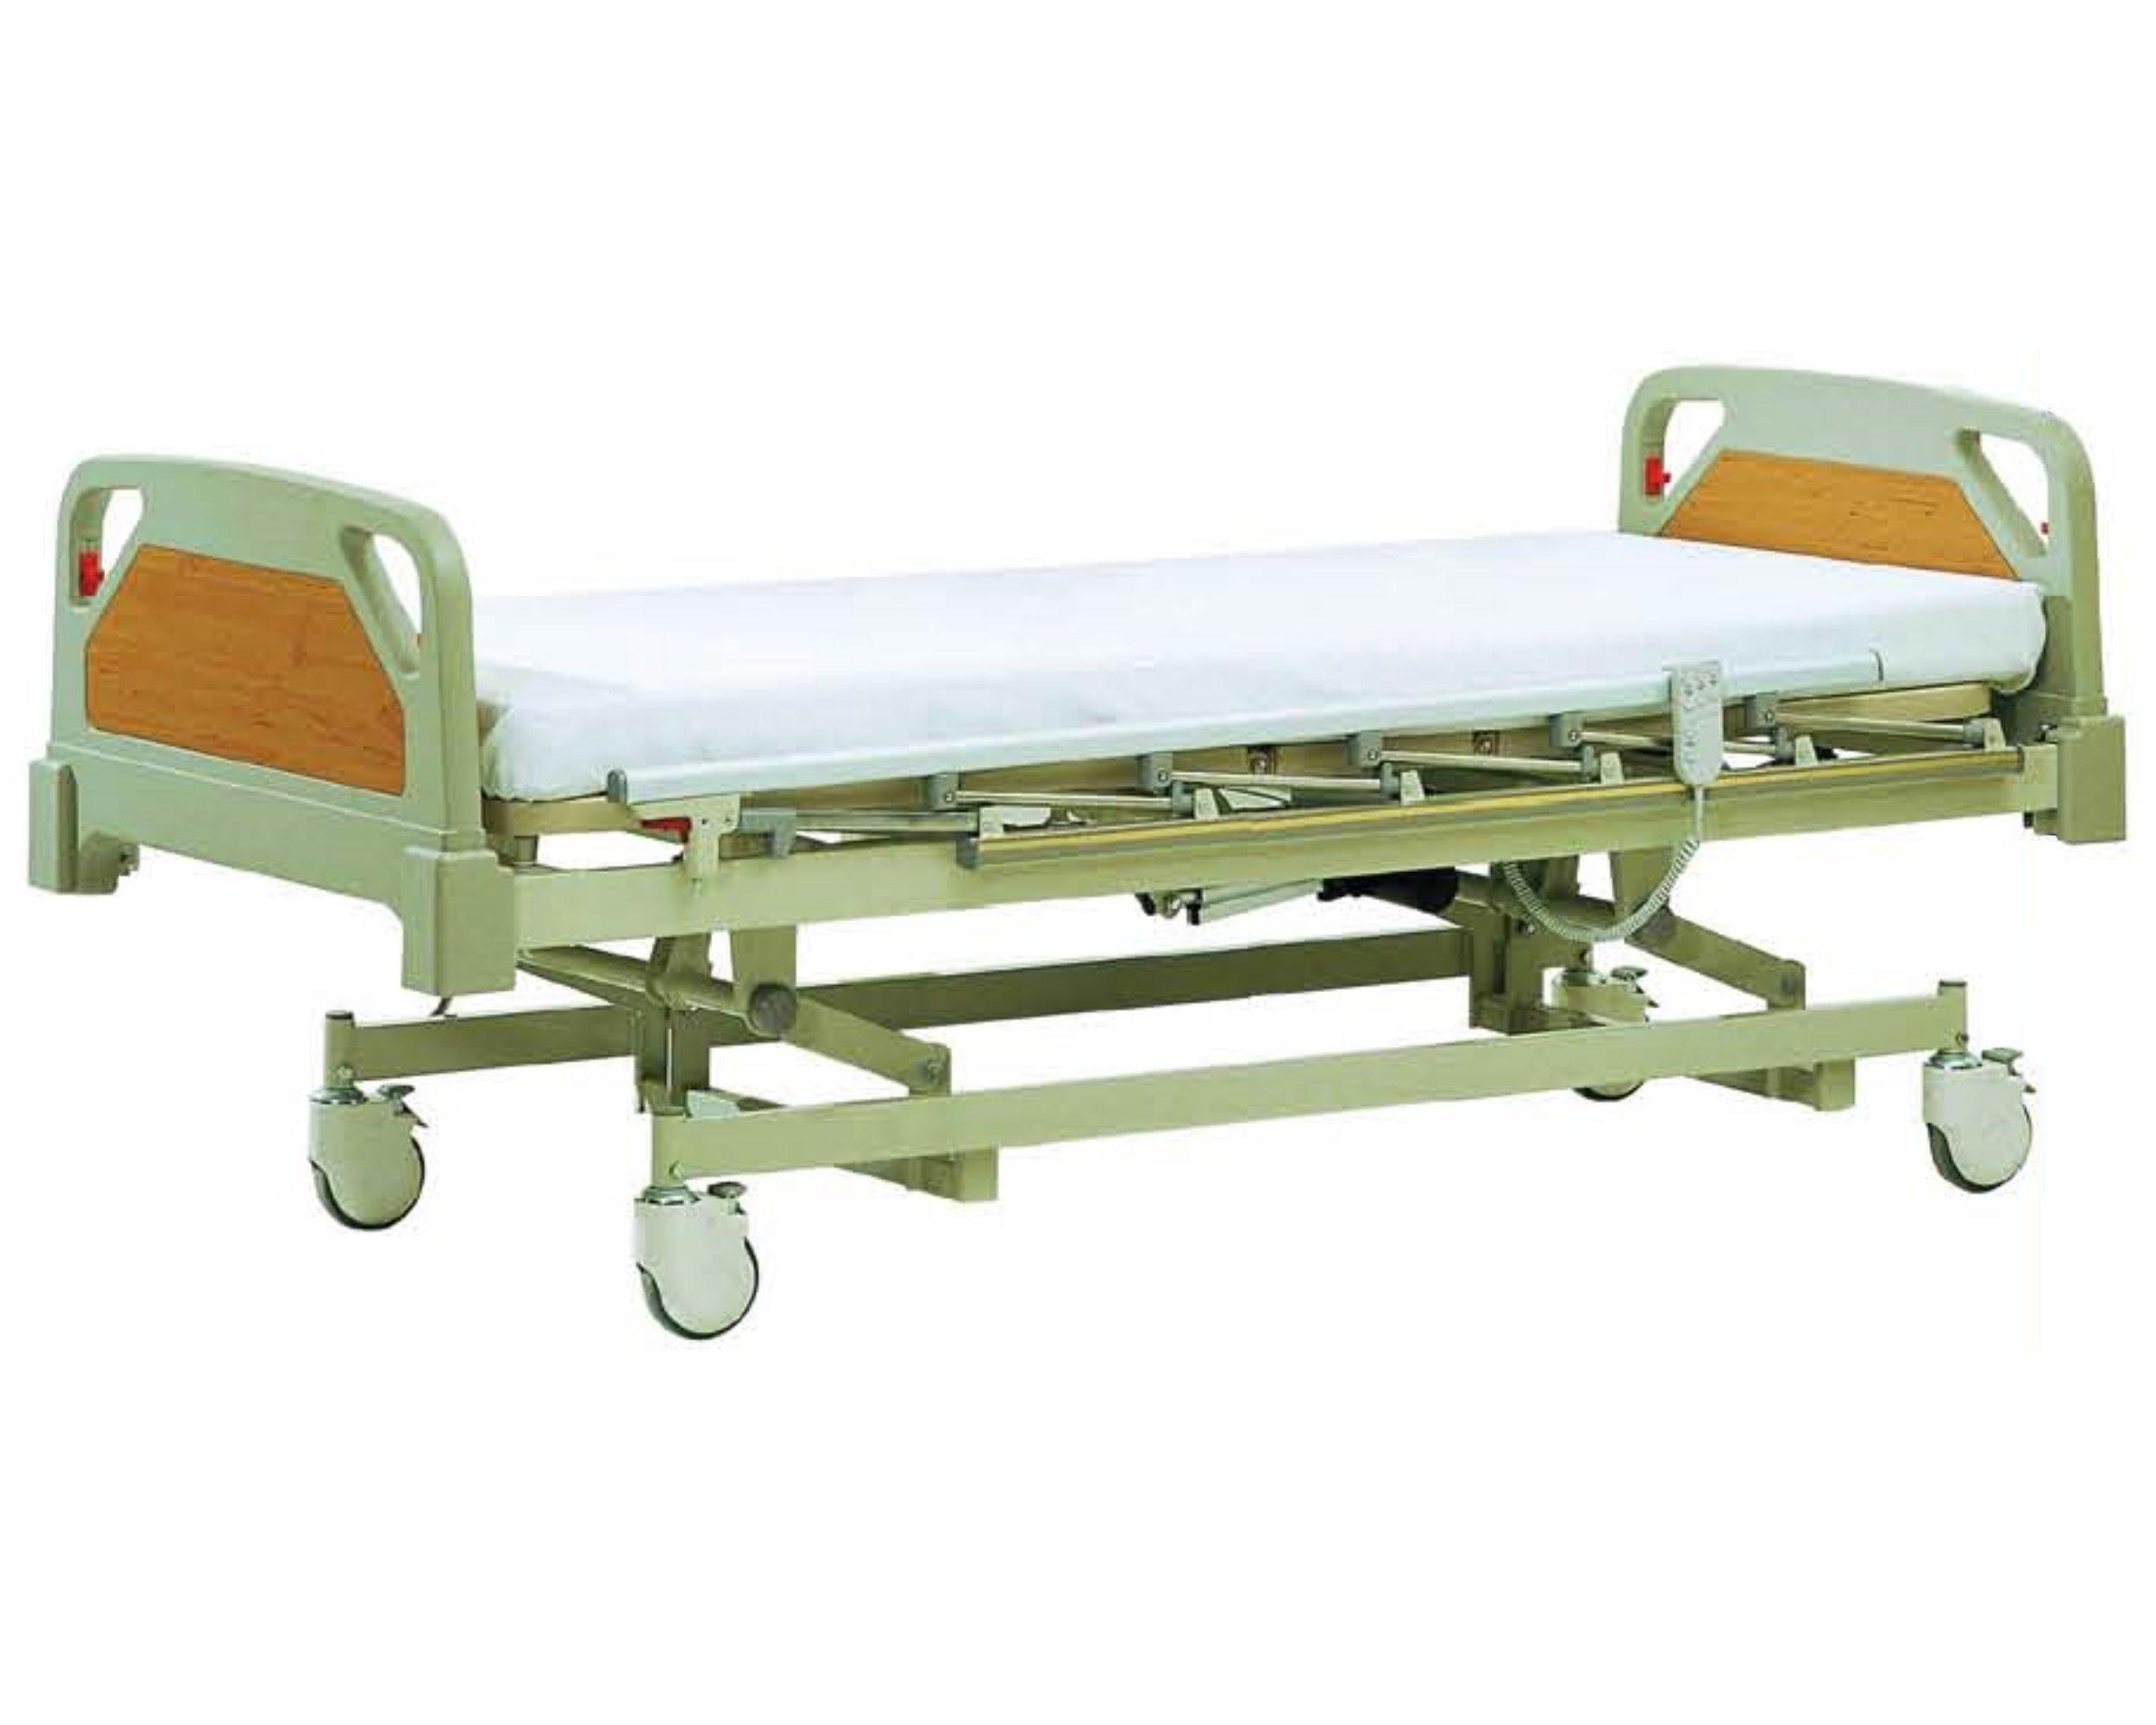 b shower furniture nursing equipment lm gif medical trolley